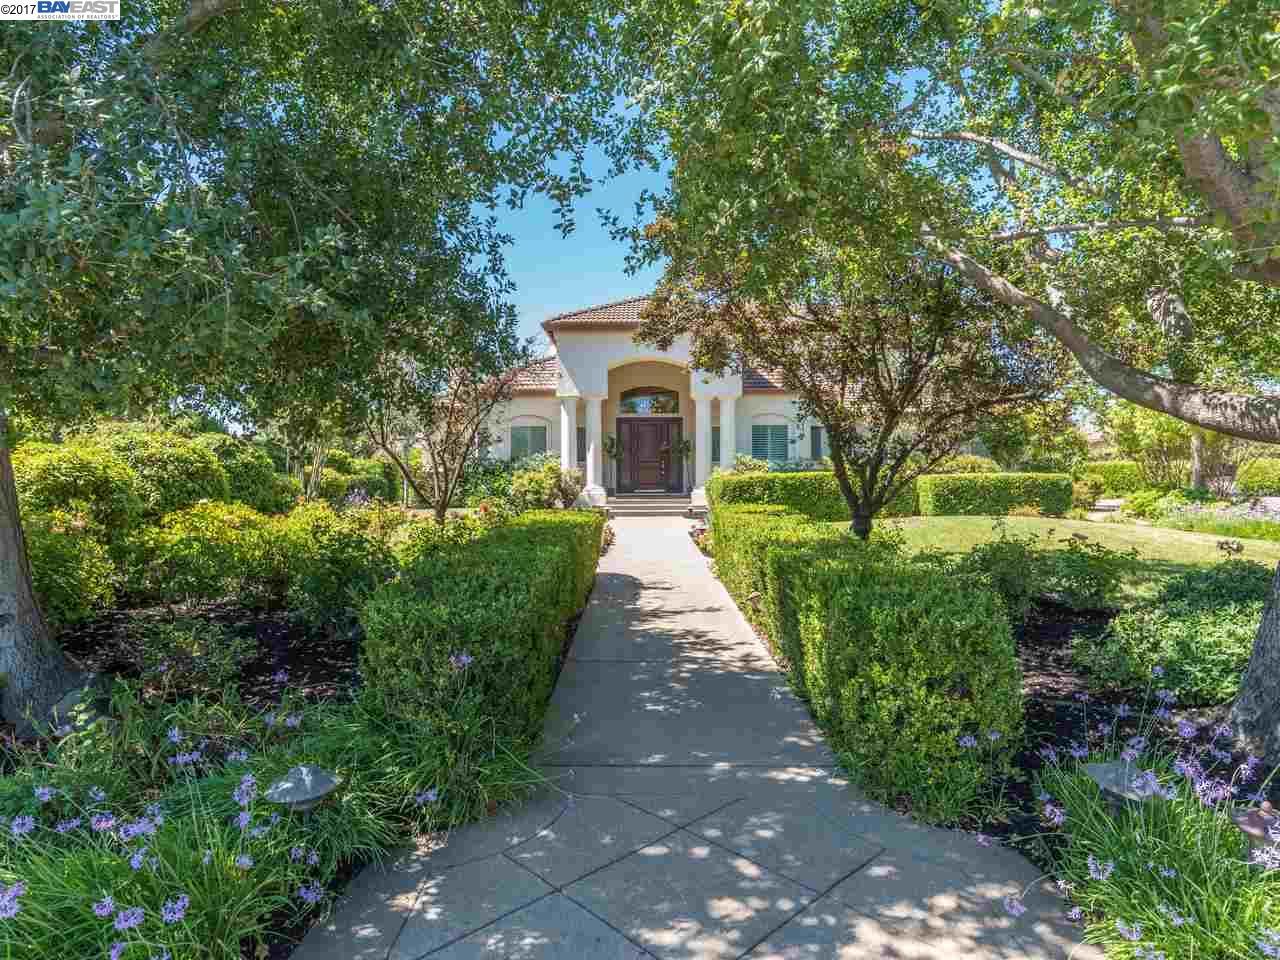 Single Family Home for Sale at 553 Santel Court Pleasanton, California 94566 United States